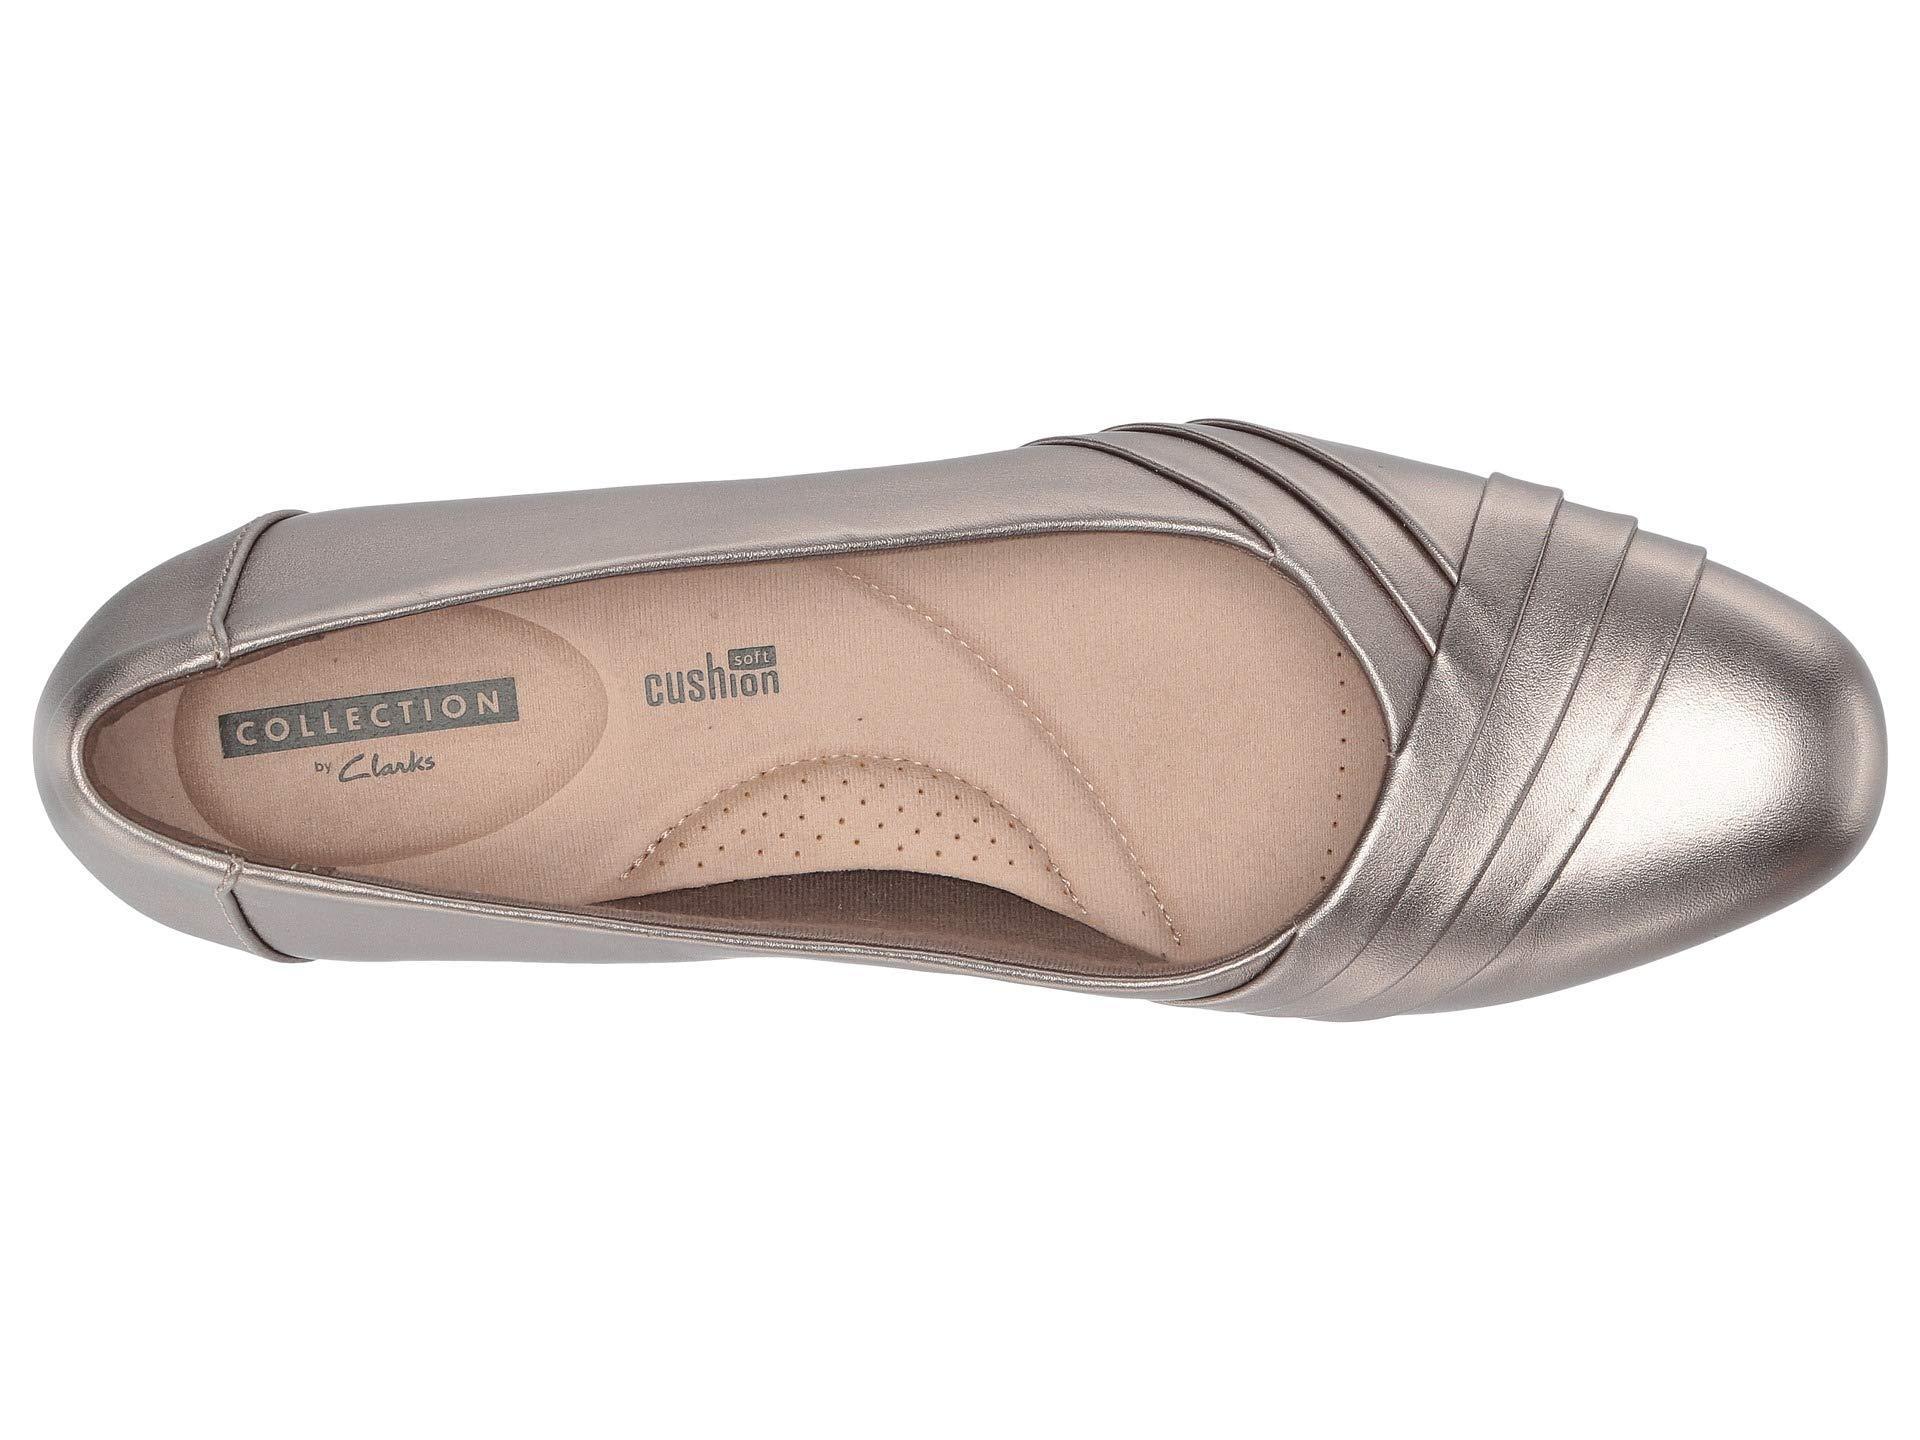 8c0828aa878 Lyst - Clarks Juliet Petra (pewter Leather) Women s 1-2 Inch Heel Shoes